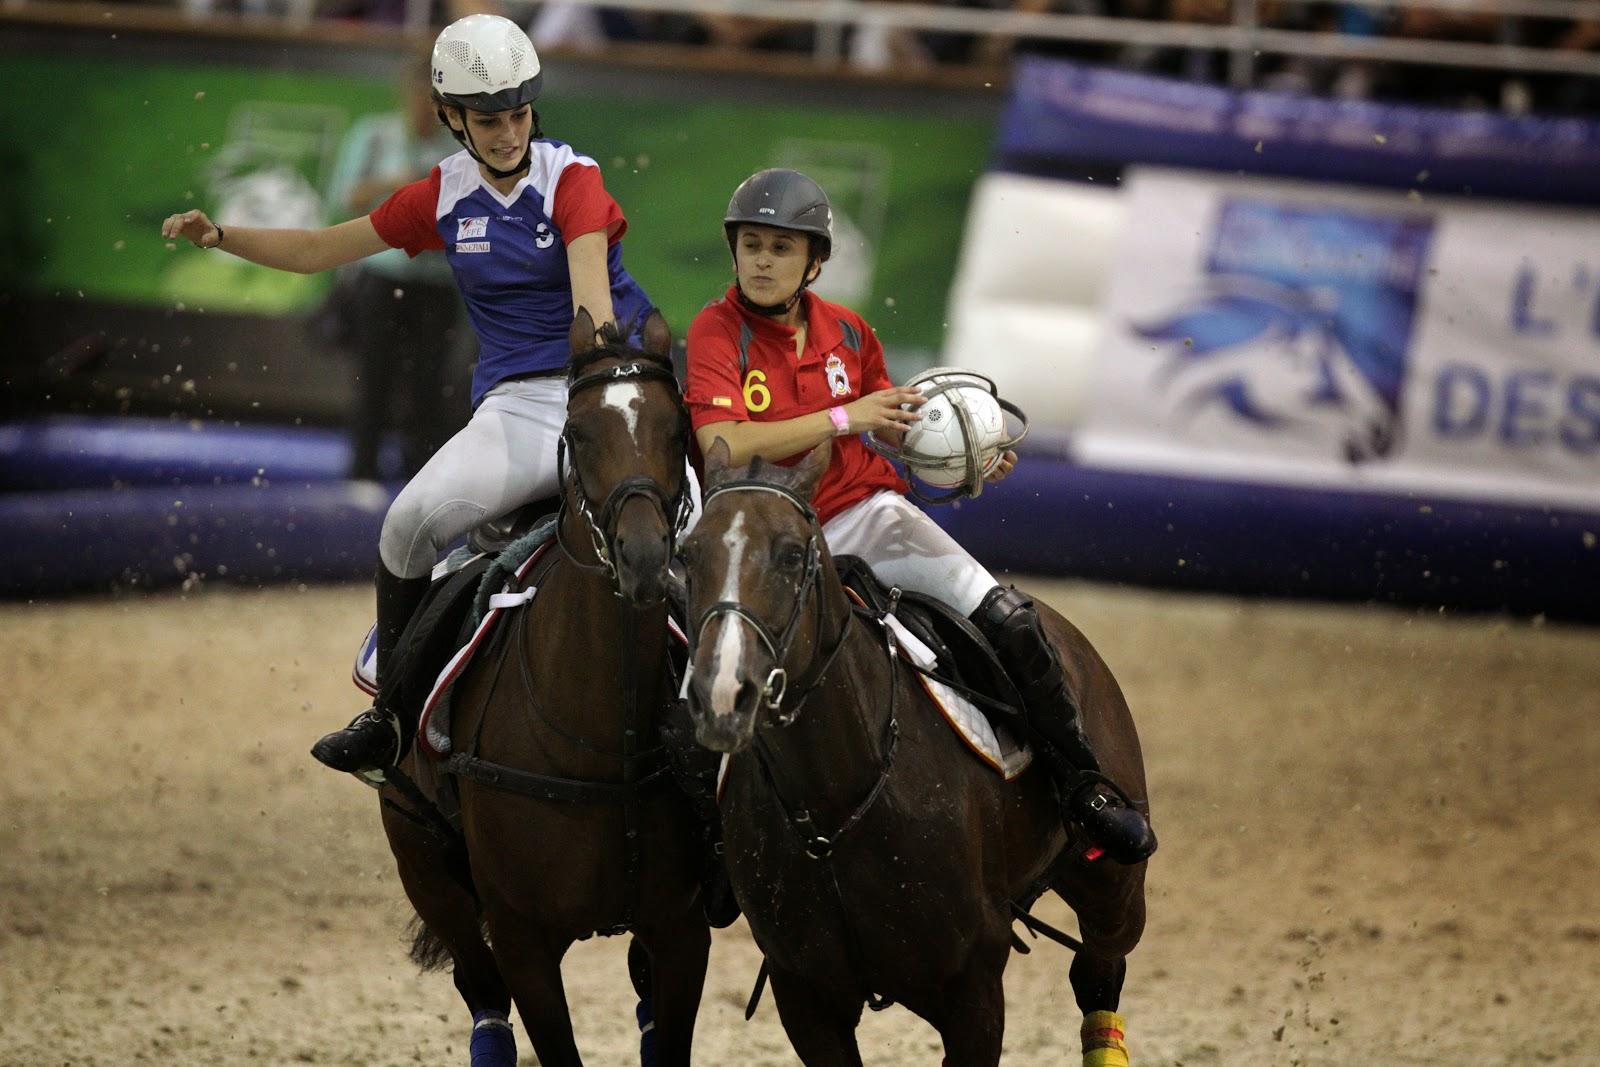 Horse-Ball game during 2014 FEI World Equestrian Games